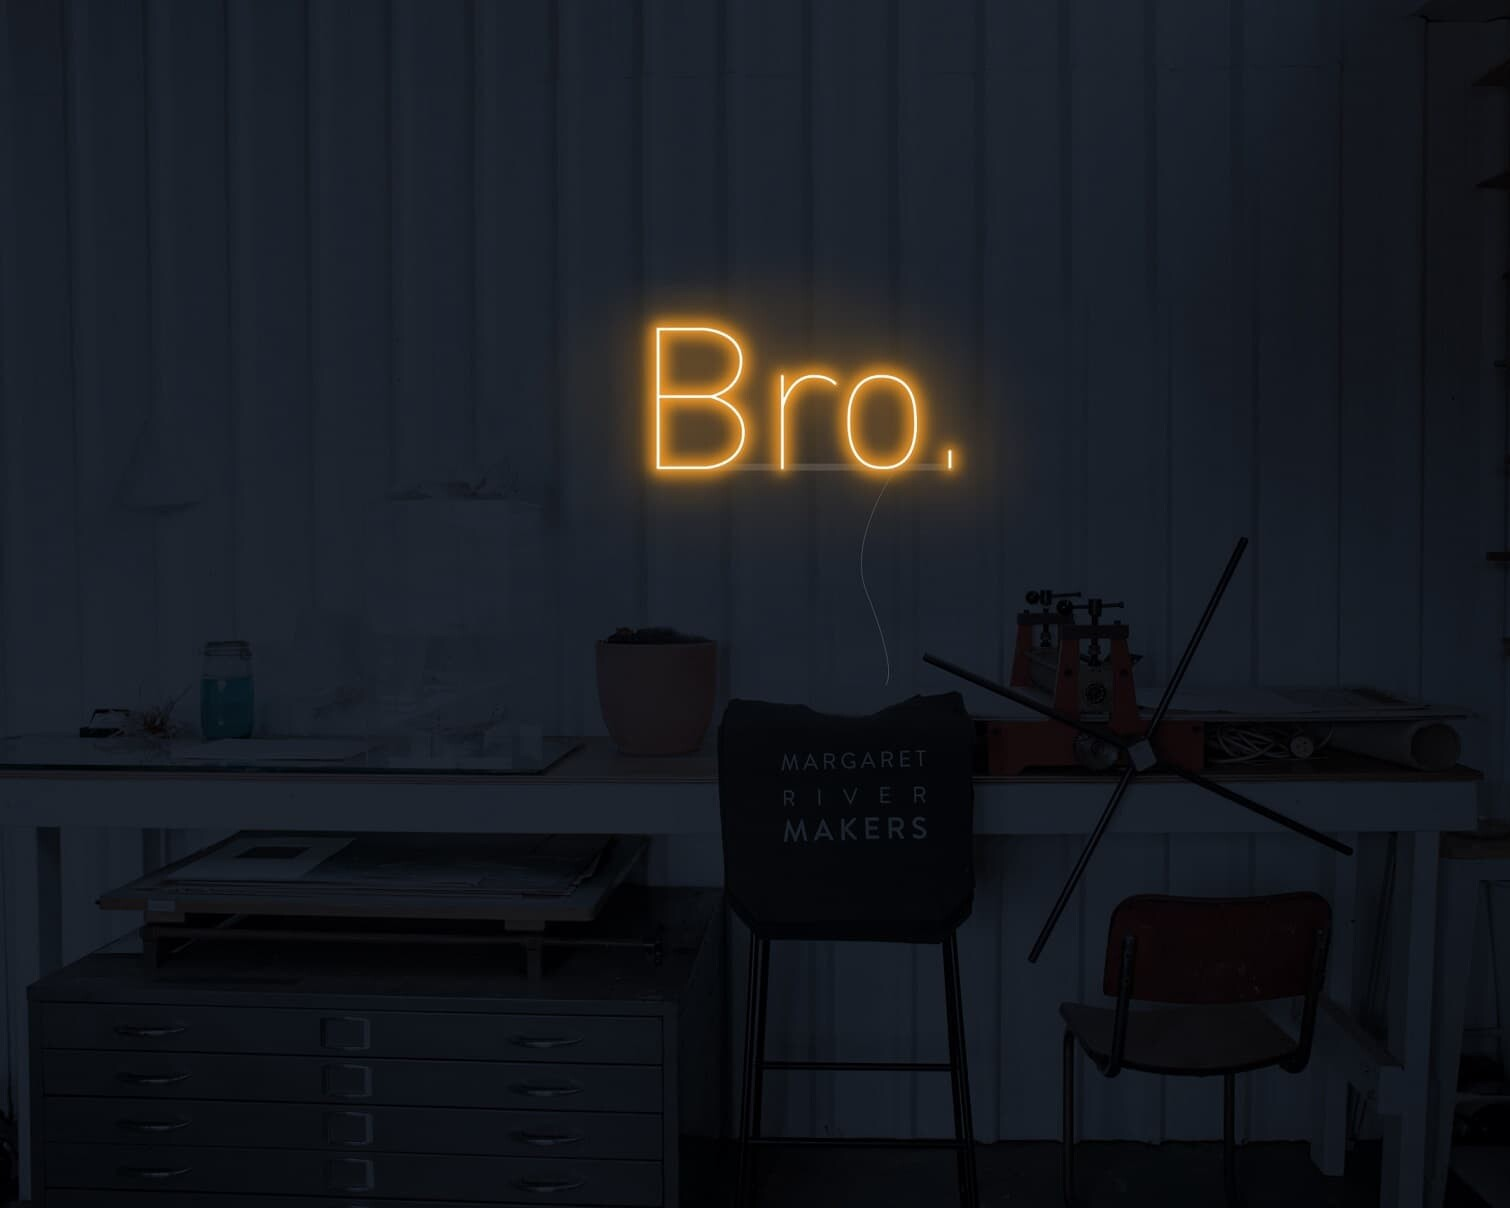 man cave neon light